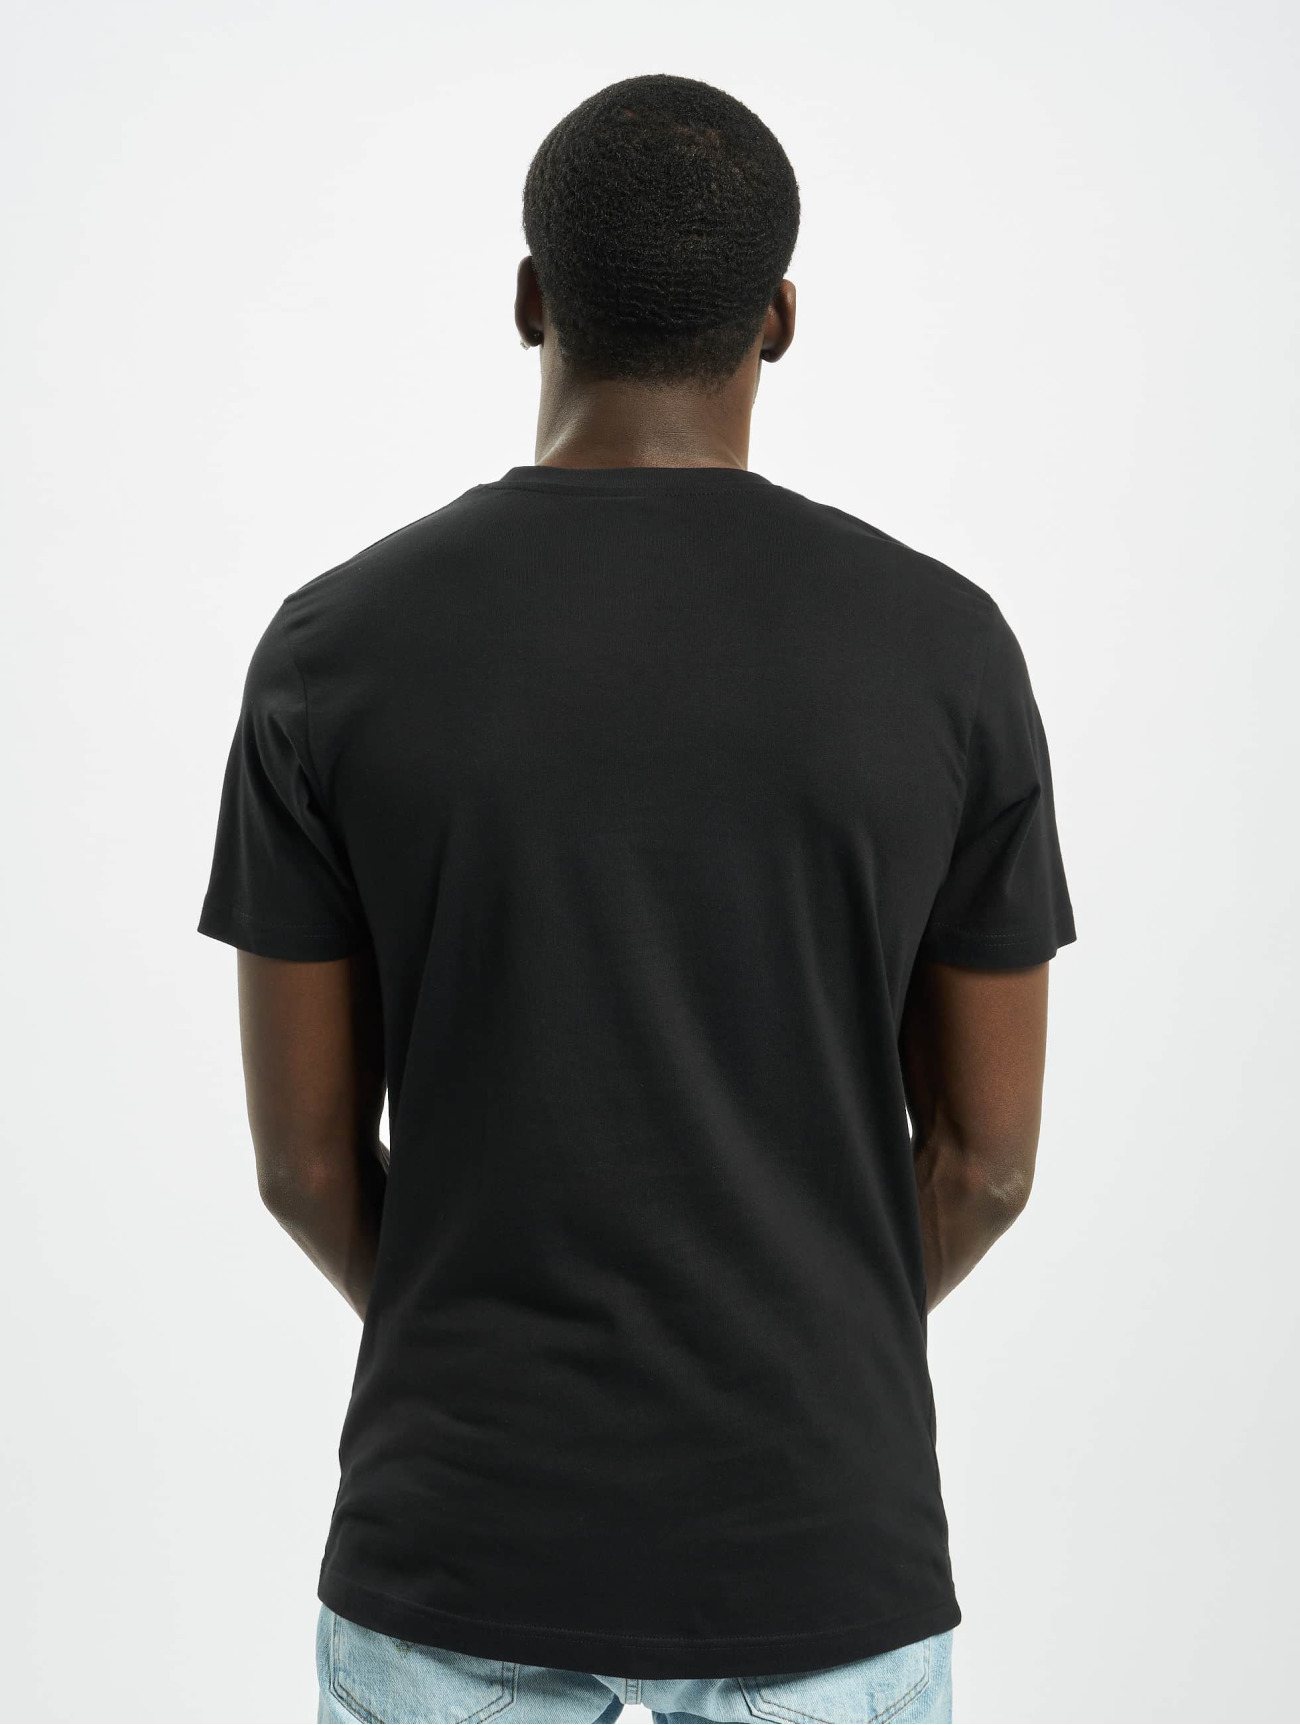 Mister Tee Overwear / T-Shirt Lil Uzi Vert Face  in black 713389